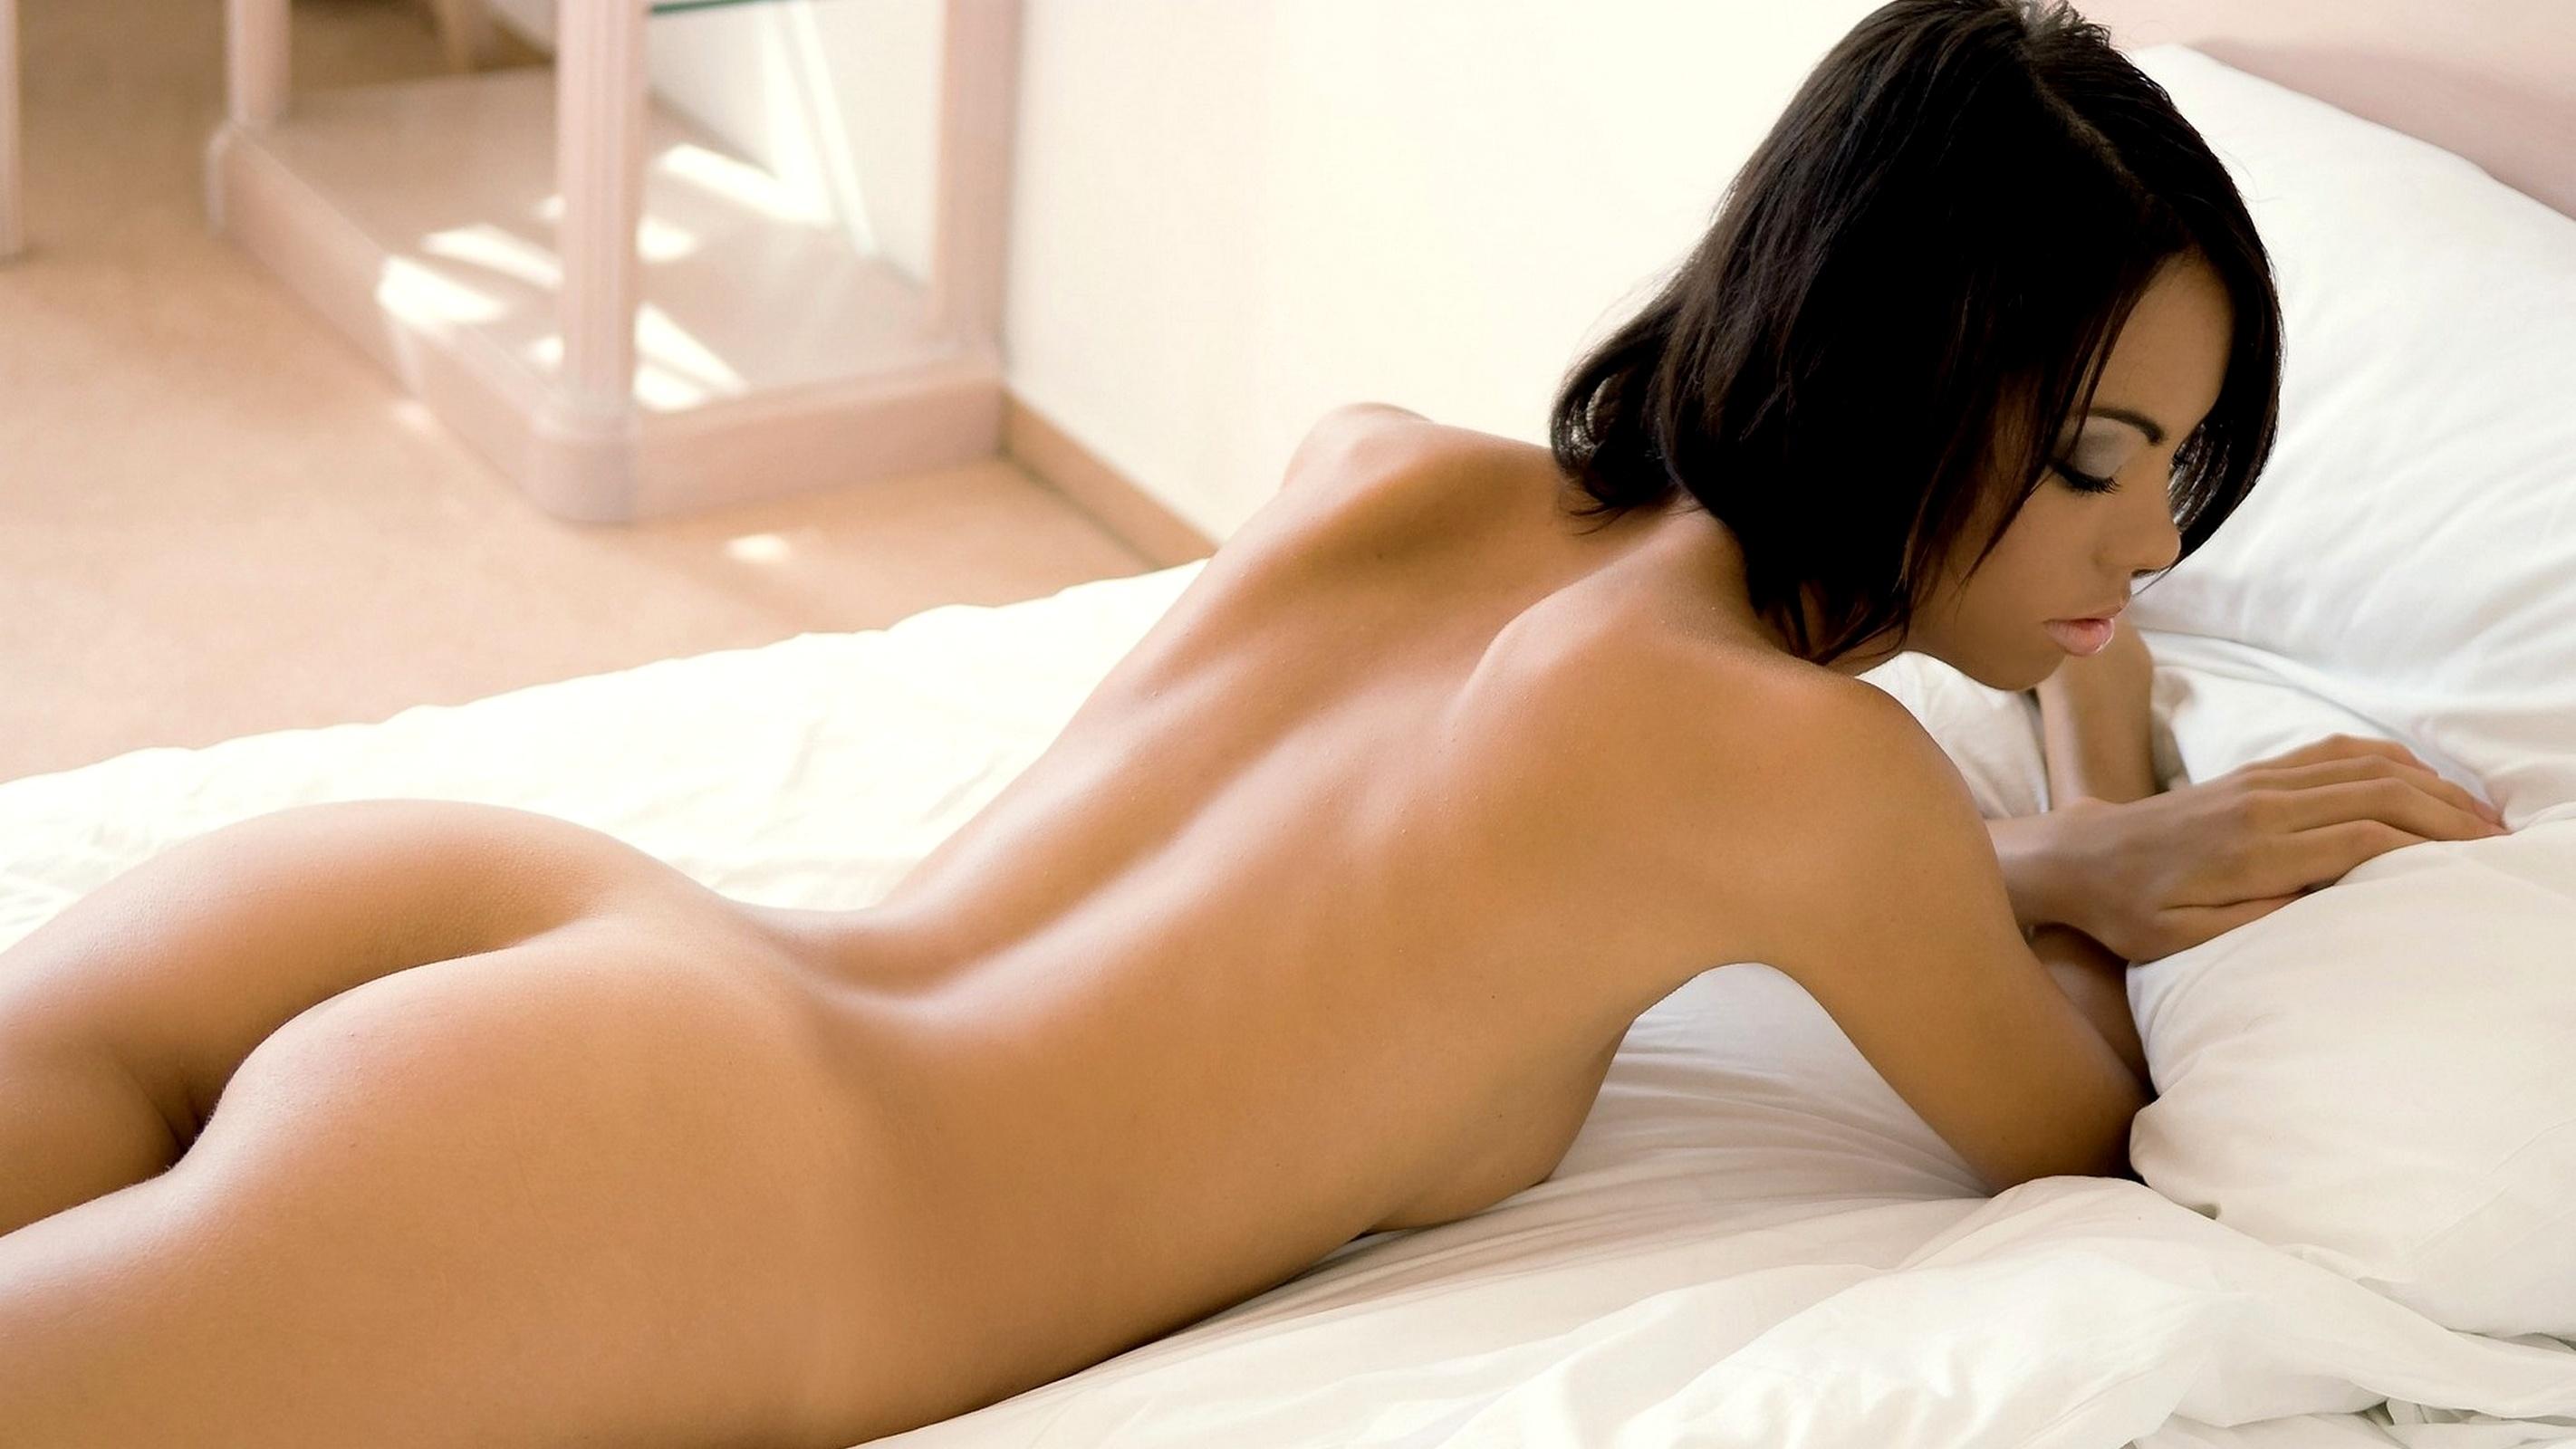 Again You Erotic nude wallpapers